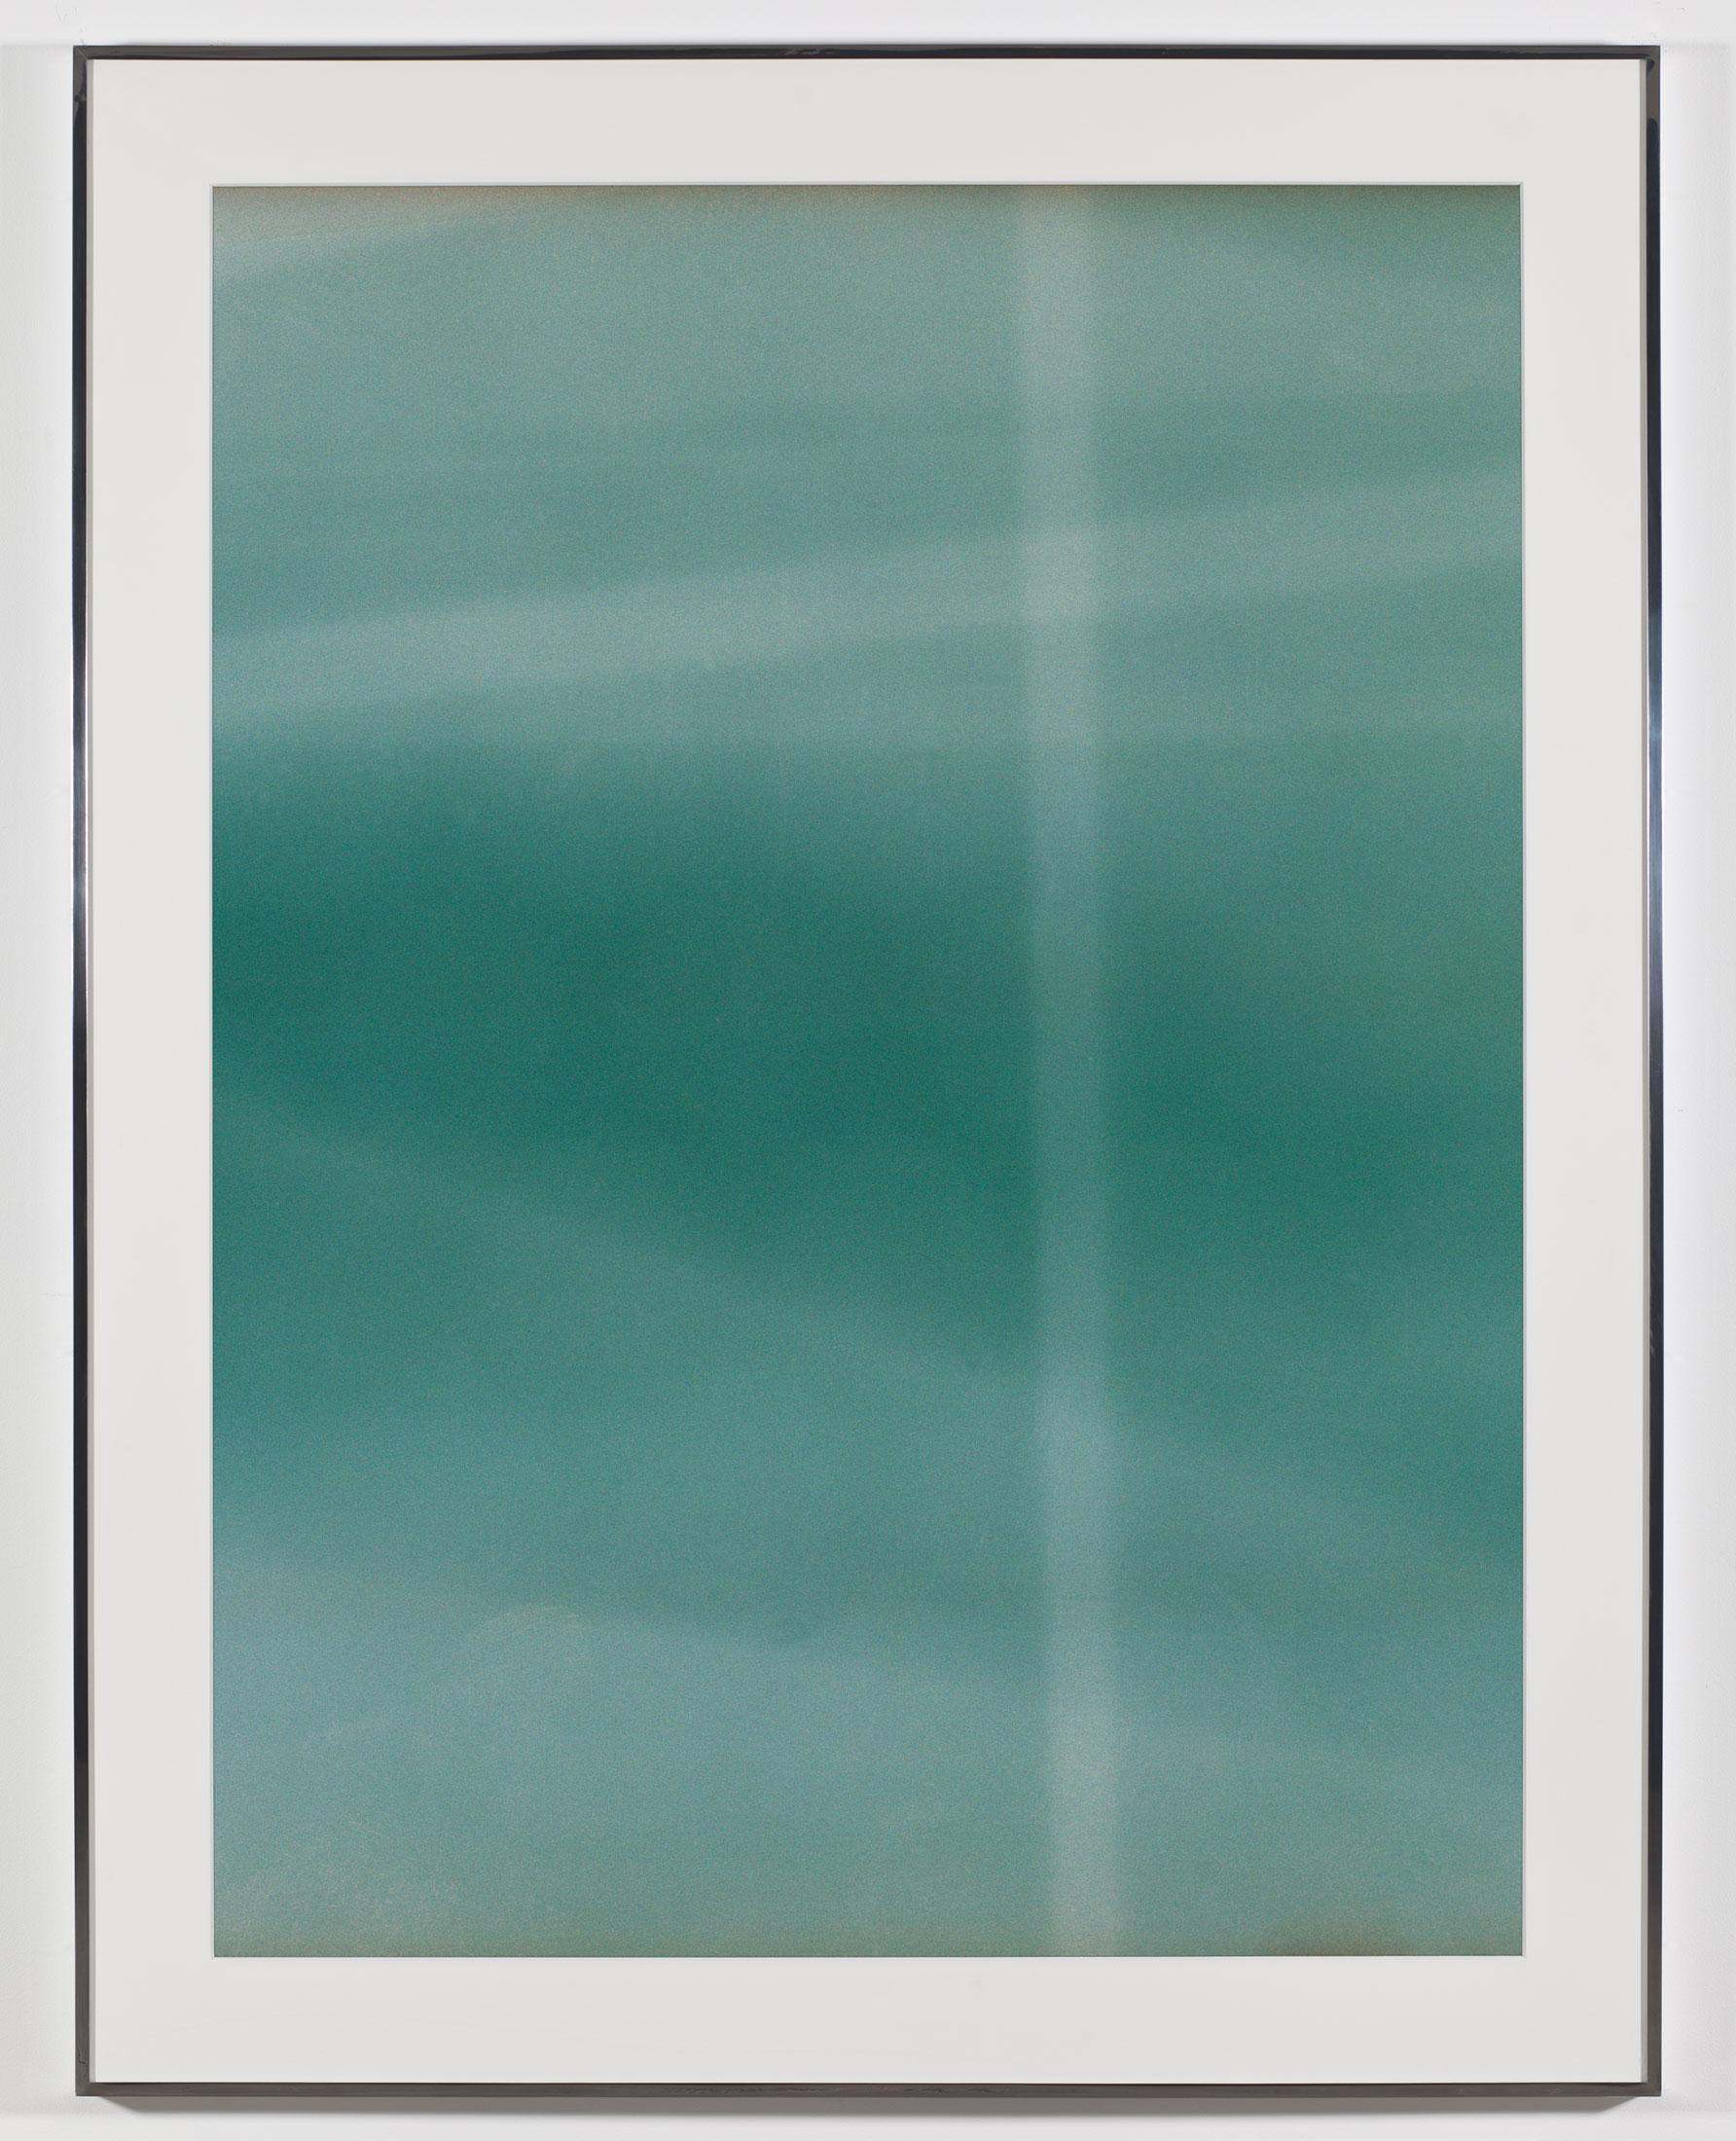 Transparency (Negative) [Kodak Portra 400NC Em. No. 51341: May 28–June 29, 2008 ORD/LAX LAX/JFK JFK/LAX]   2009  Epson Ultrachrome K3 archival ink jet print on Museo Silver Rag Paper  68 x 52 1/4 inches   Transparencies, 2008–2014    FIVE, 2009